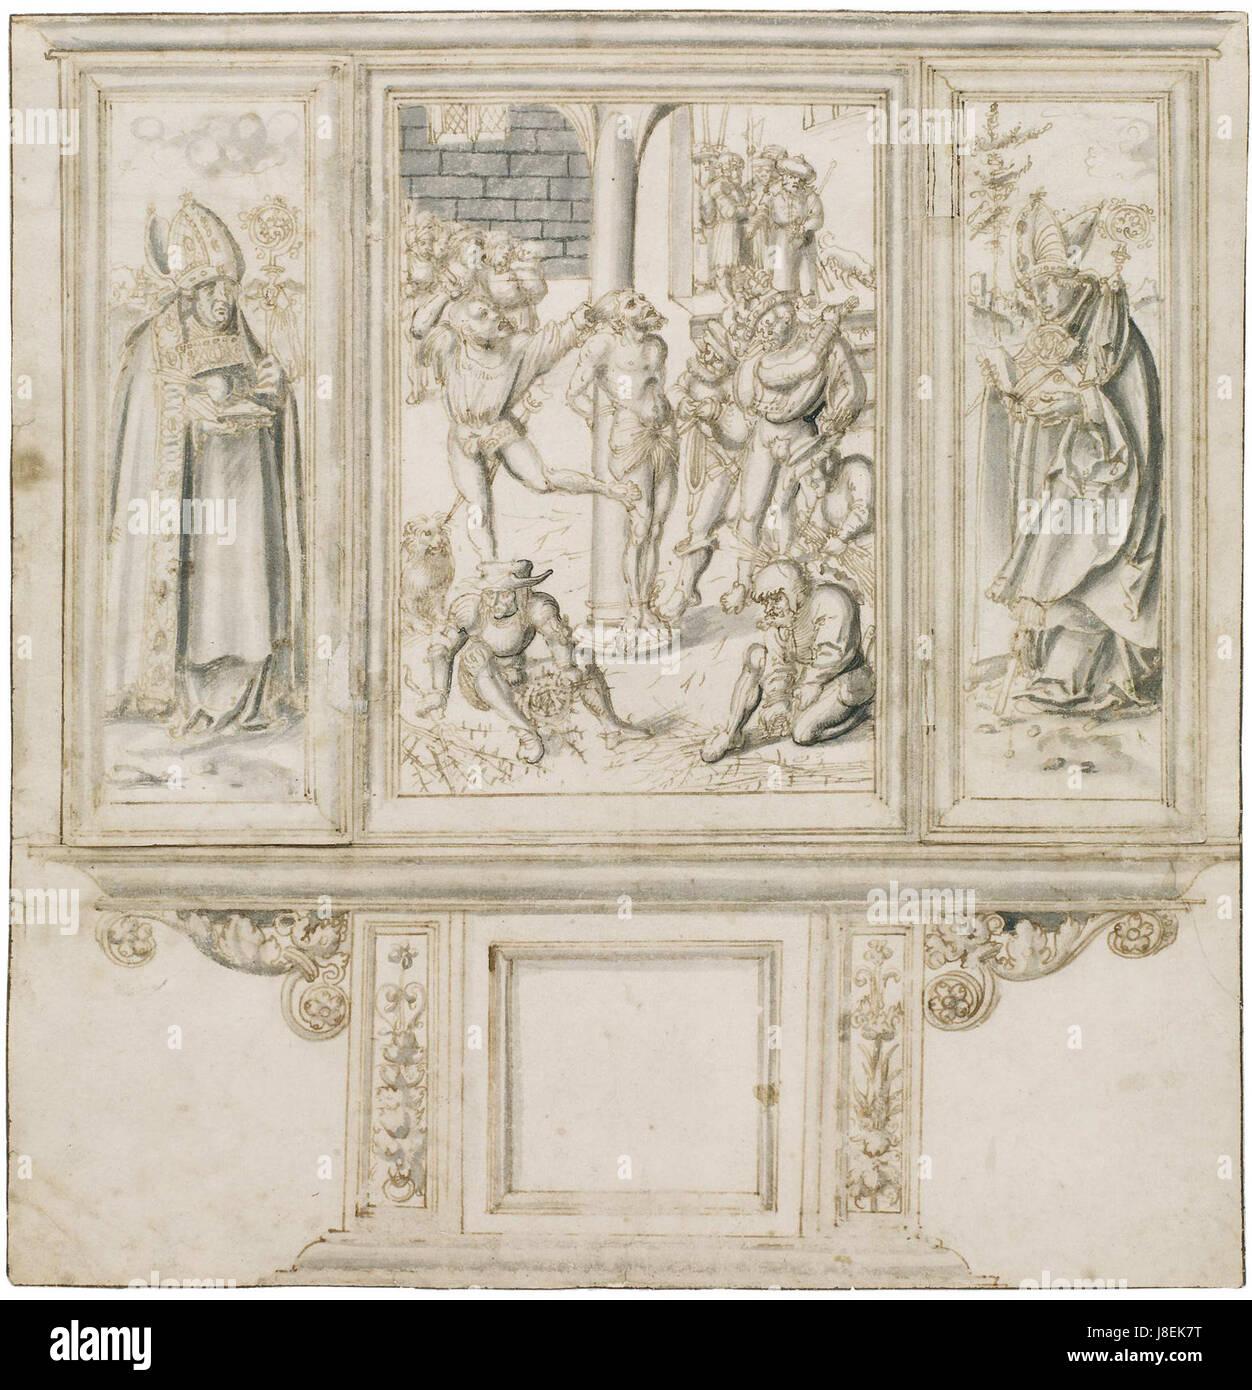 Lucas Cranach altar sketch - Stock Image